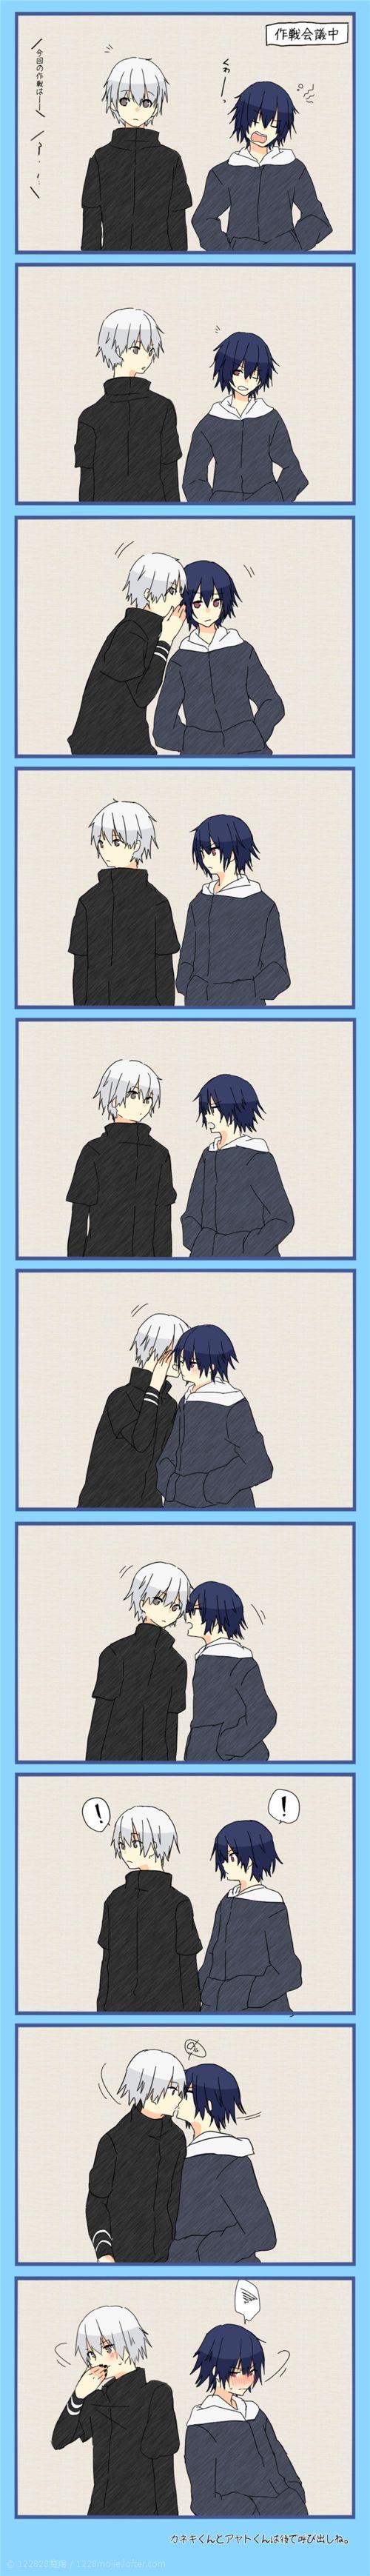 Kaneki x Ayato, don't really ship it but cute